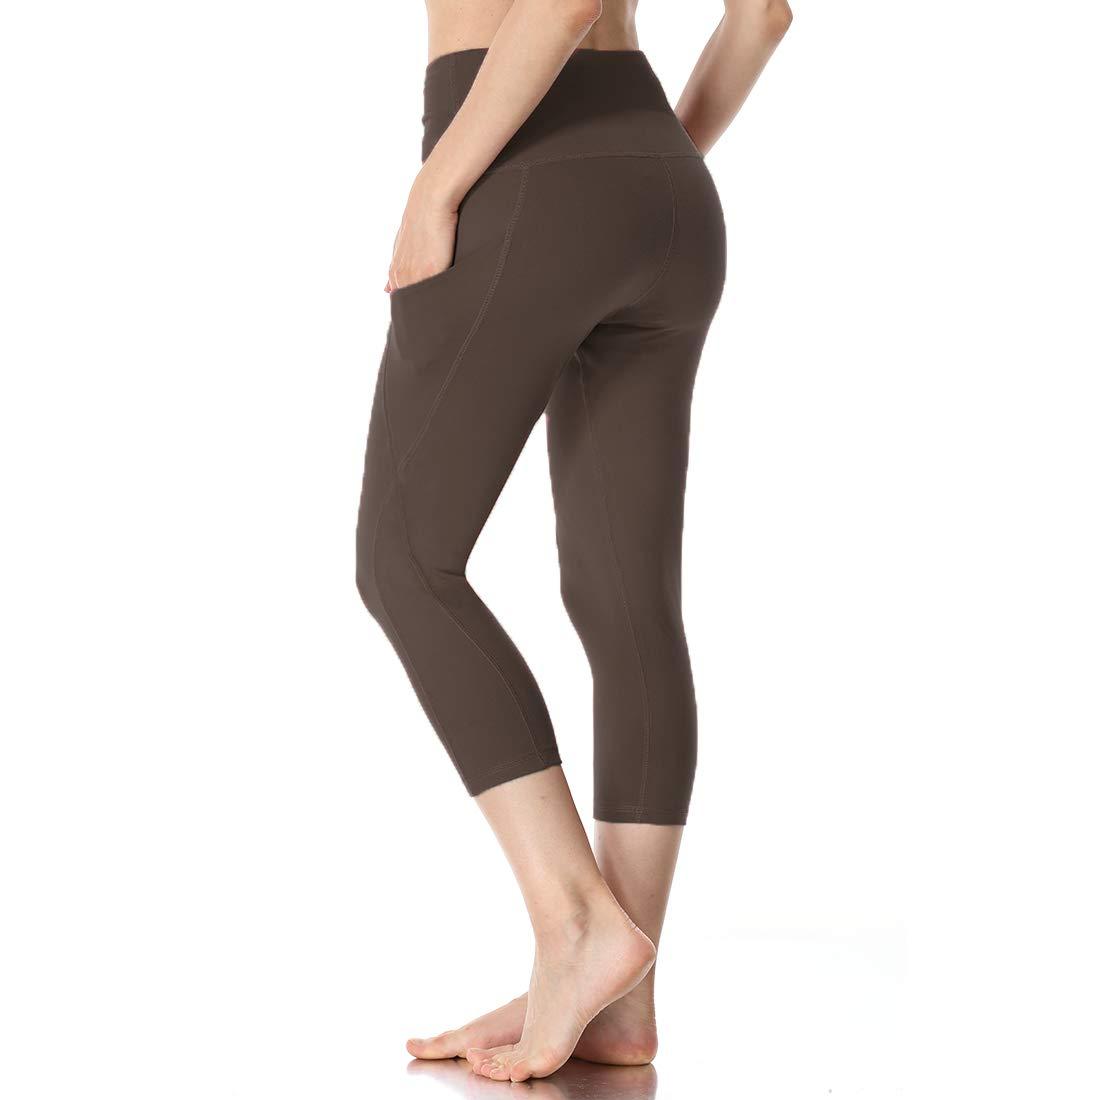 Amazon.com: Yoga Pants for Women with Pocket - Tummy Control ...